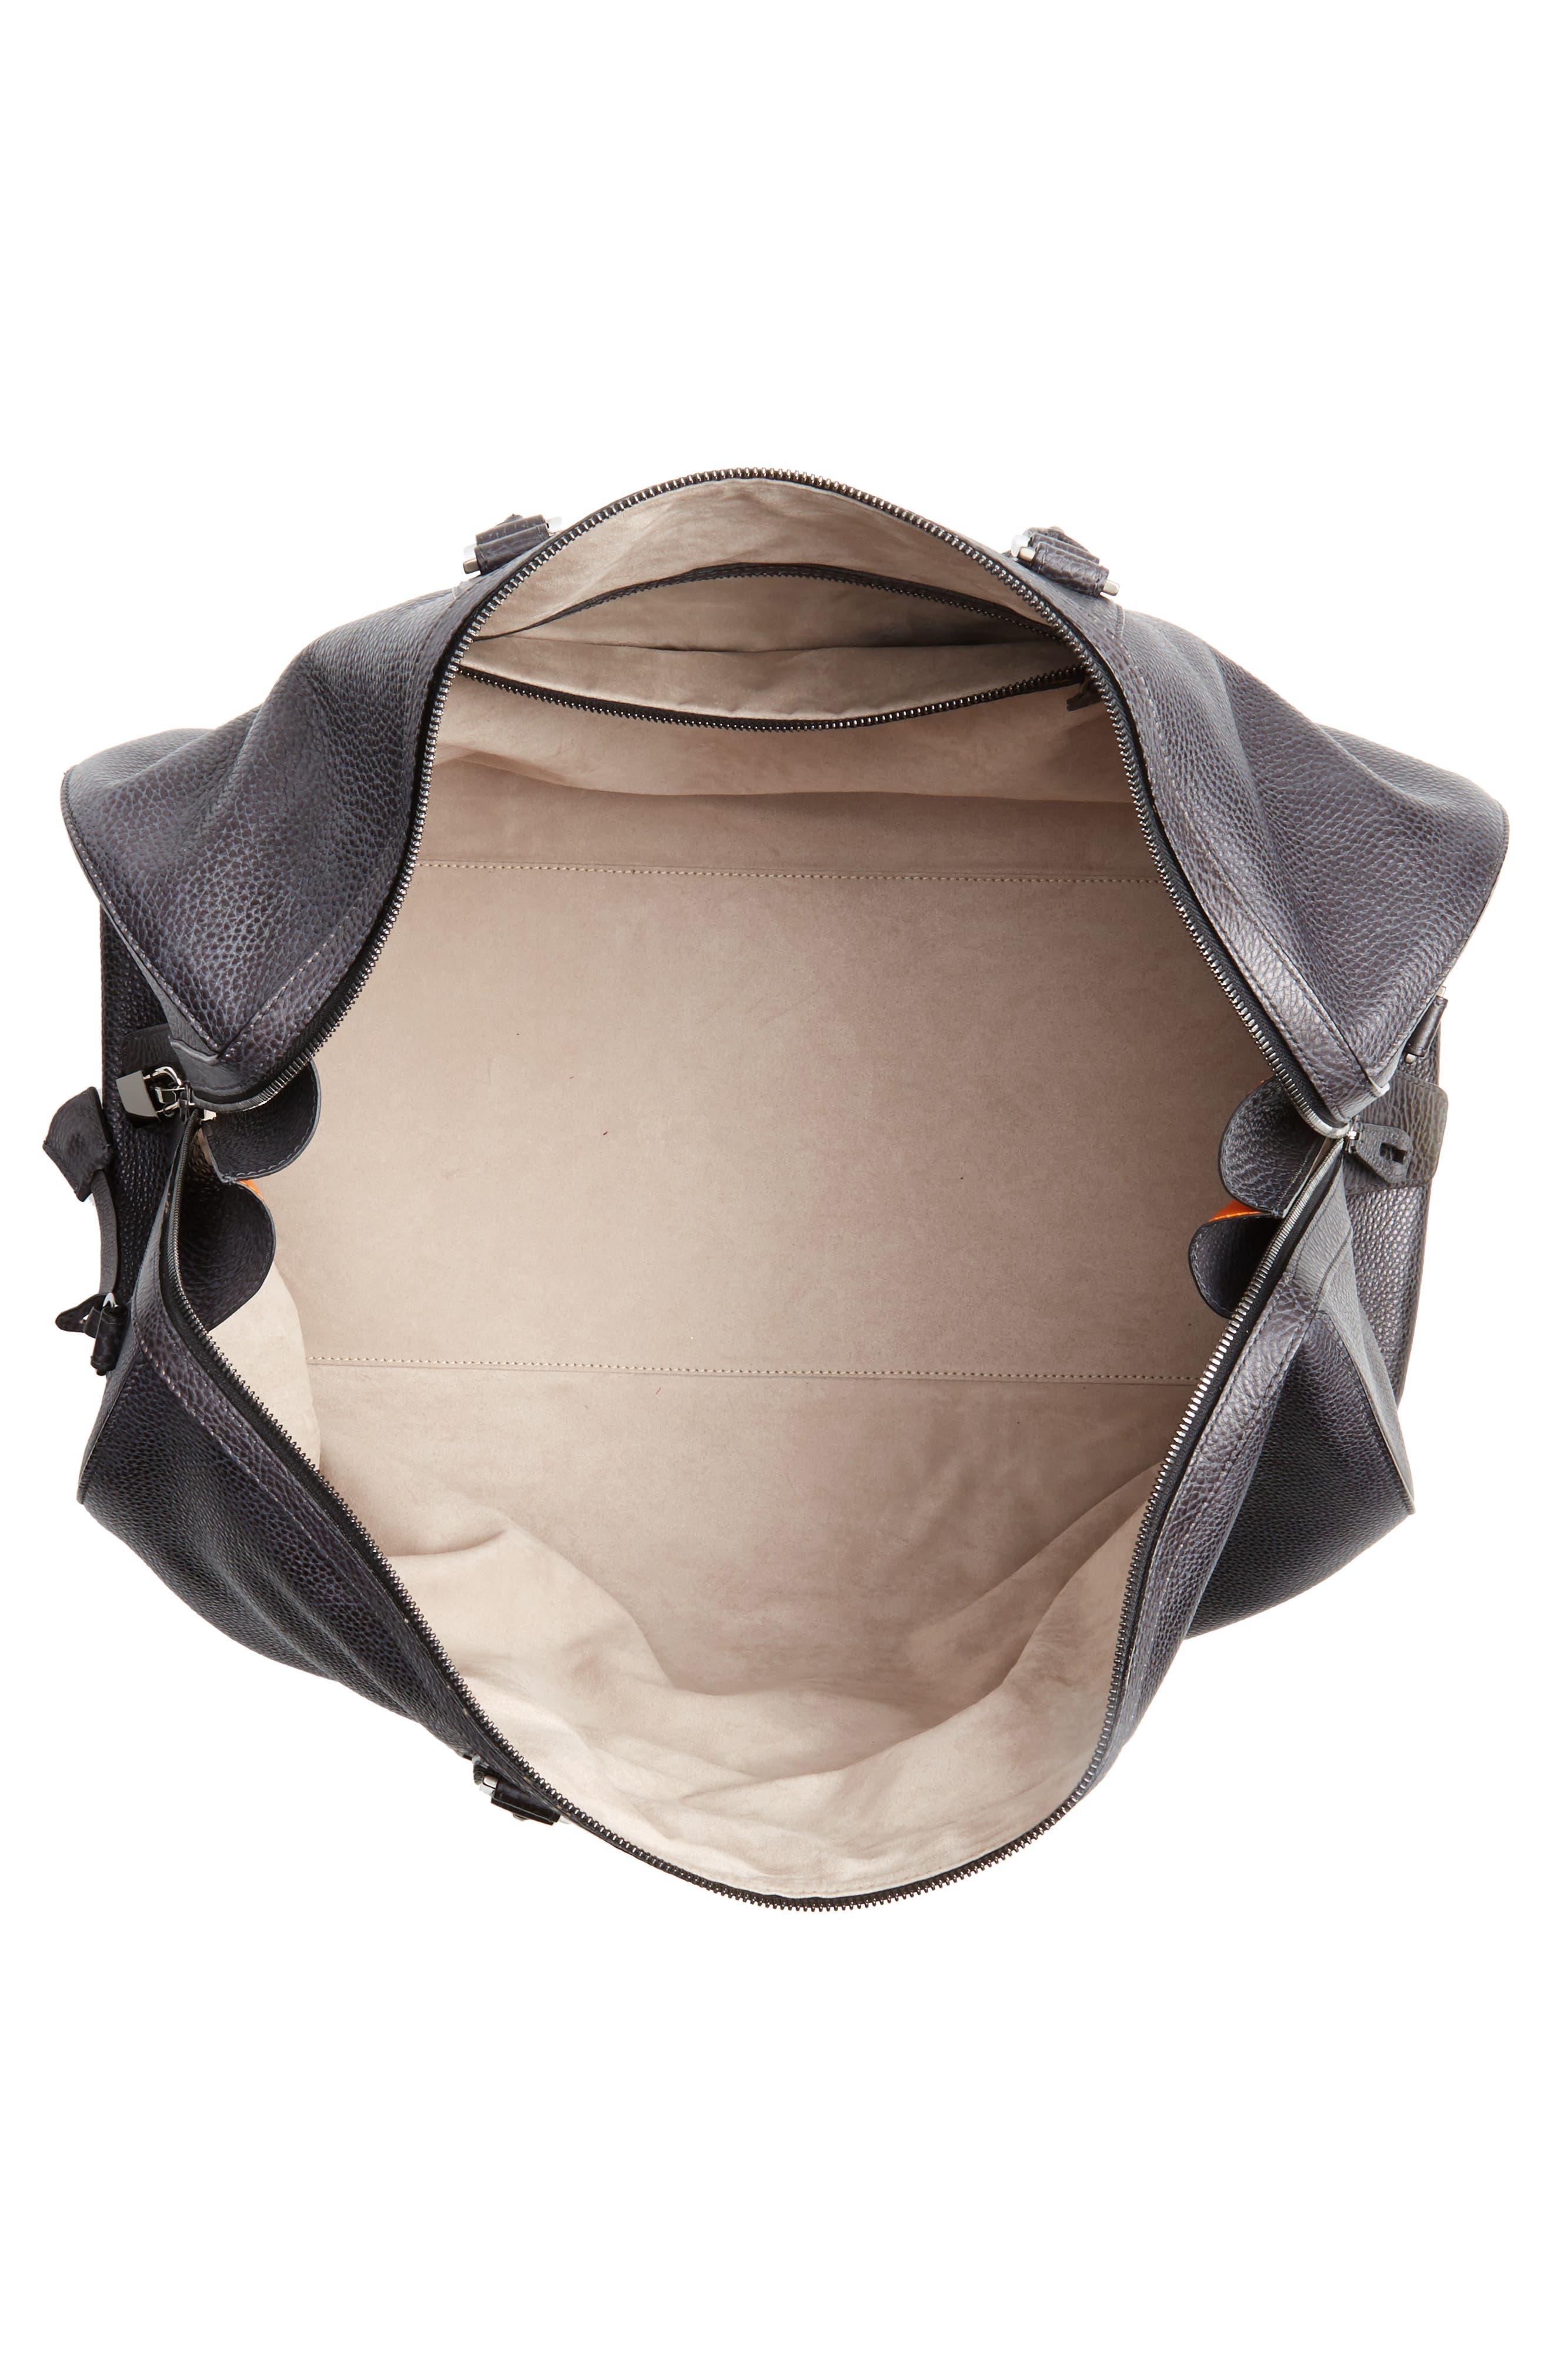 Traveler Leather Duffel Bag,                             Alternate thumbnail 4, color,                             020